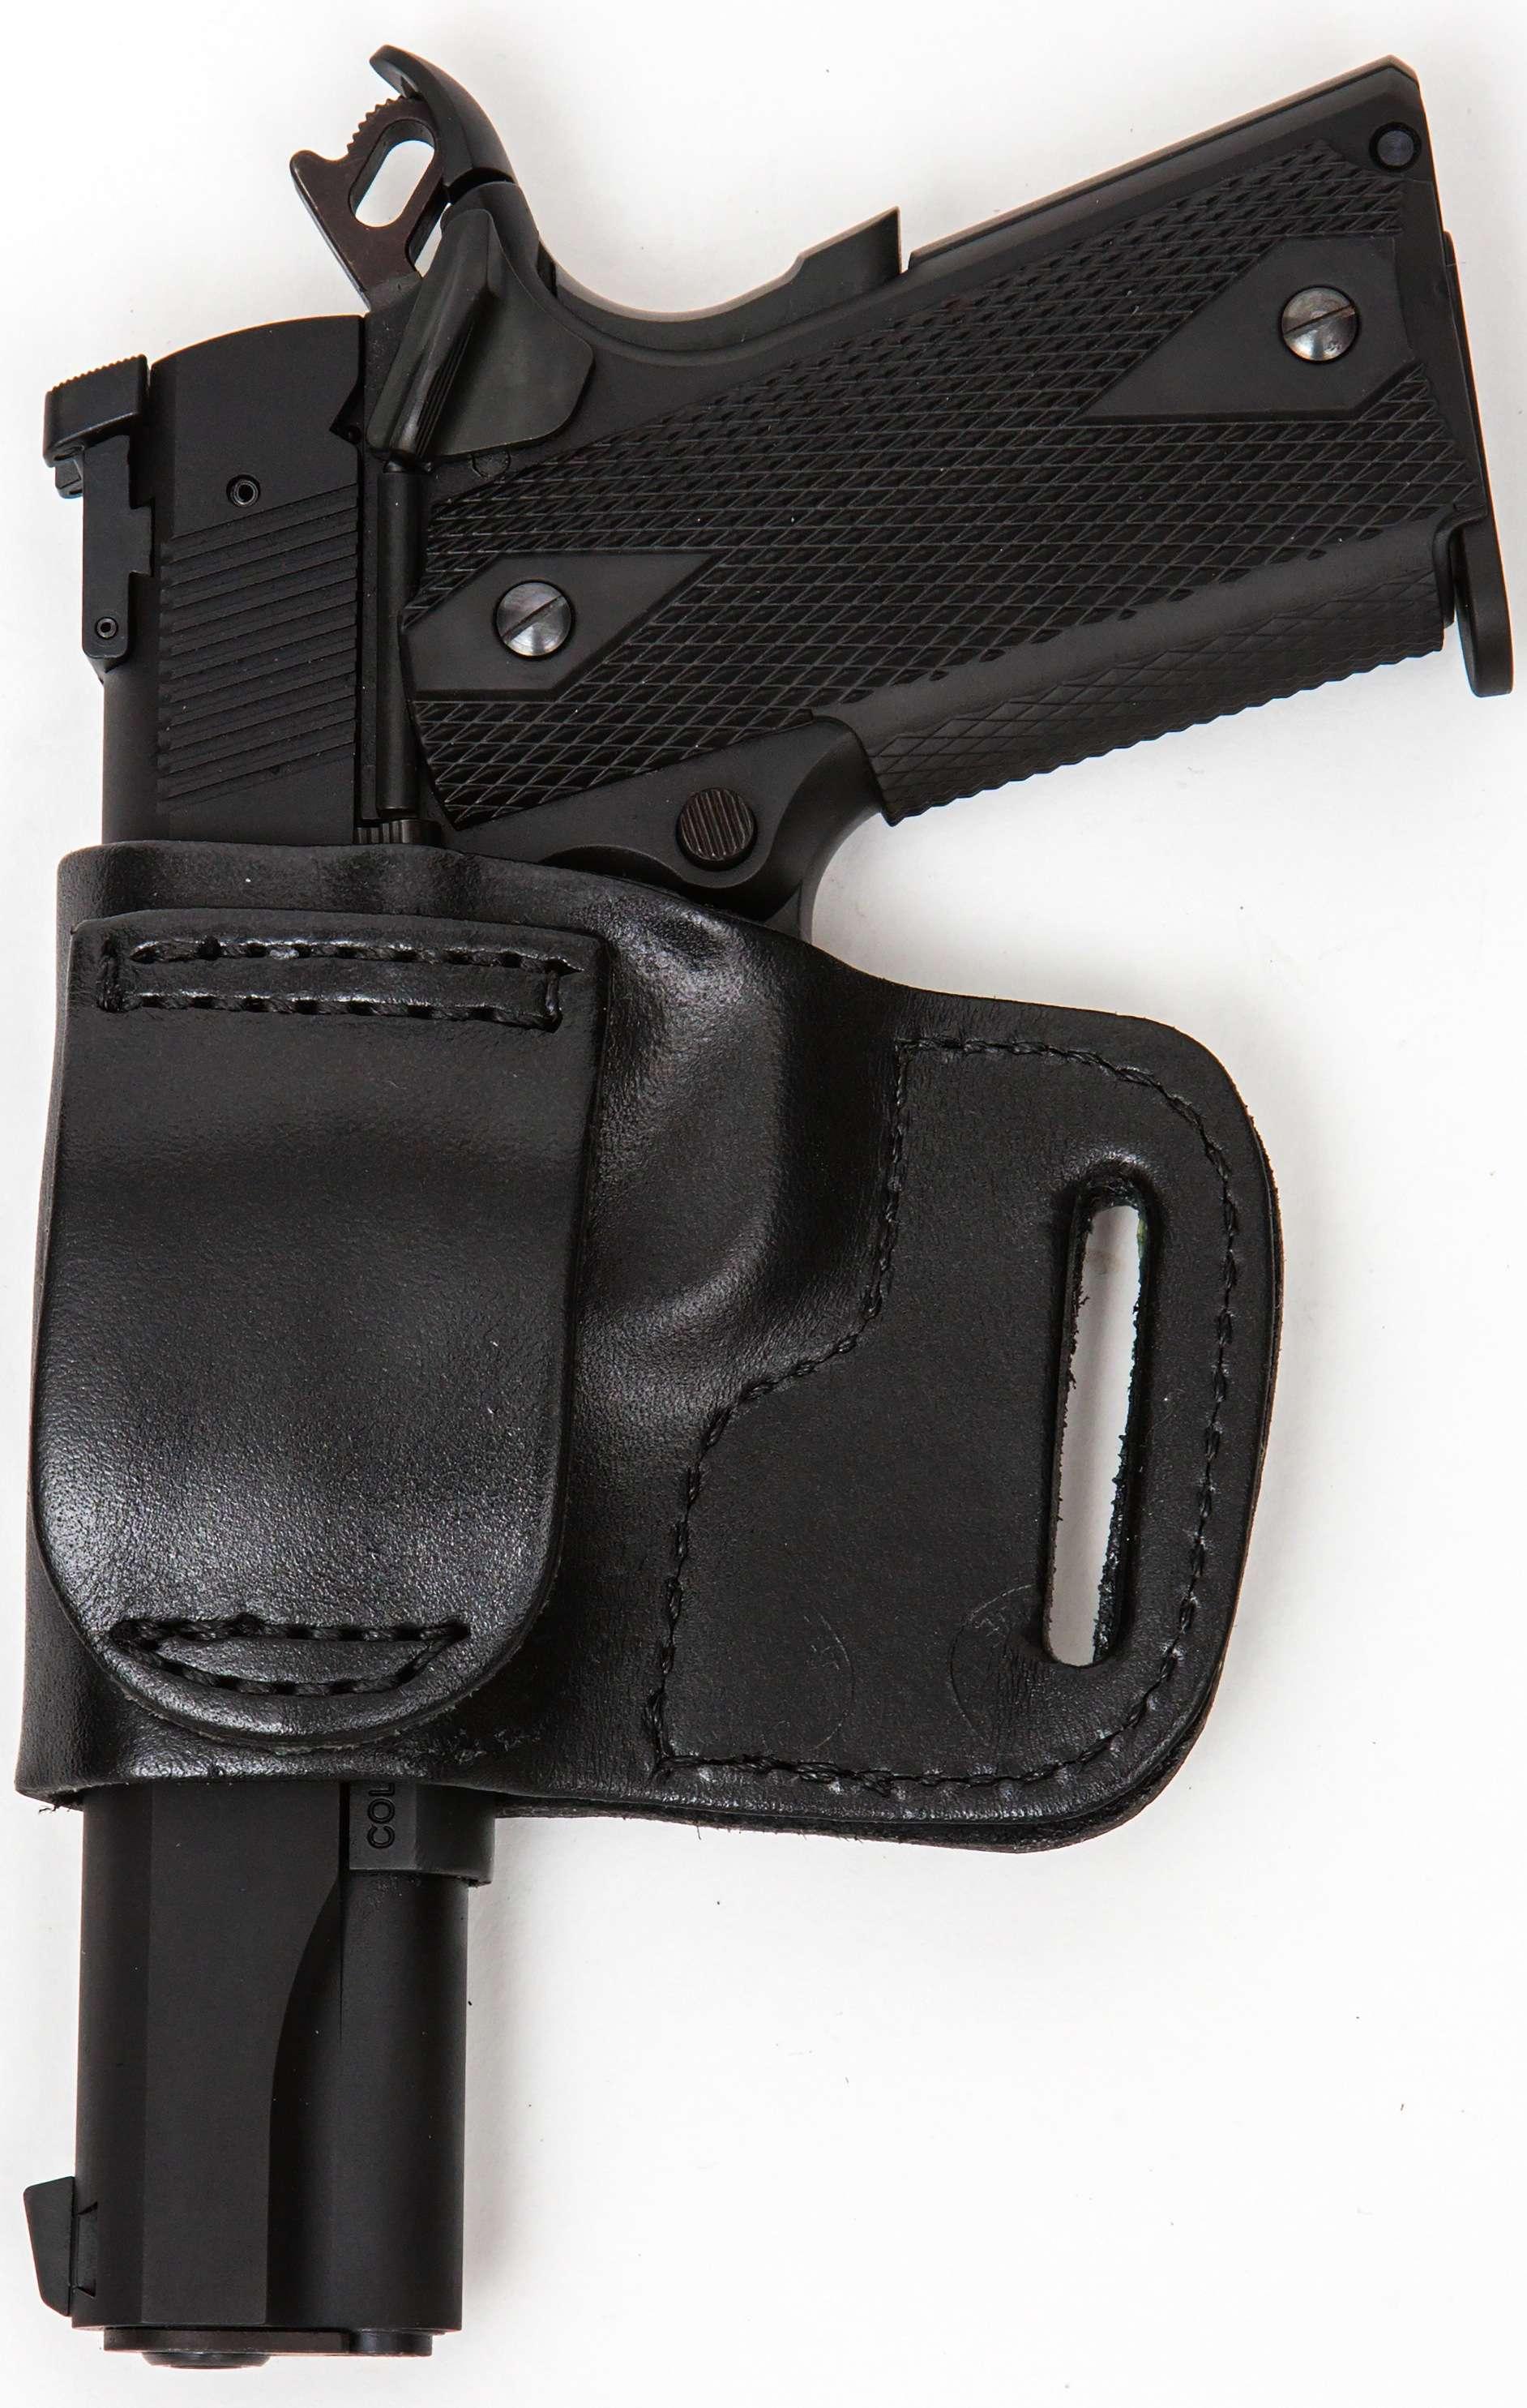 Hunting Pro Carry LT RH LH OWB IWB Leather Gun Holster For